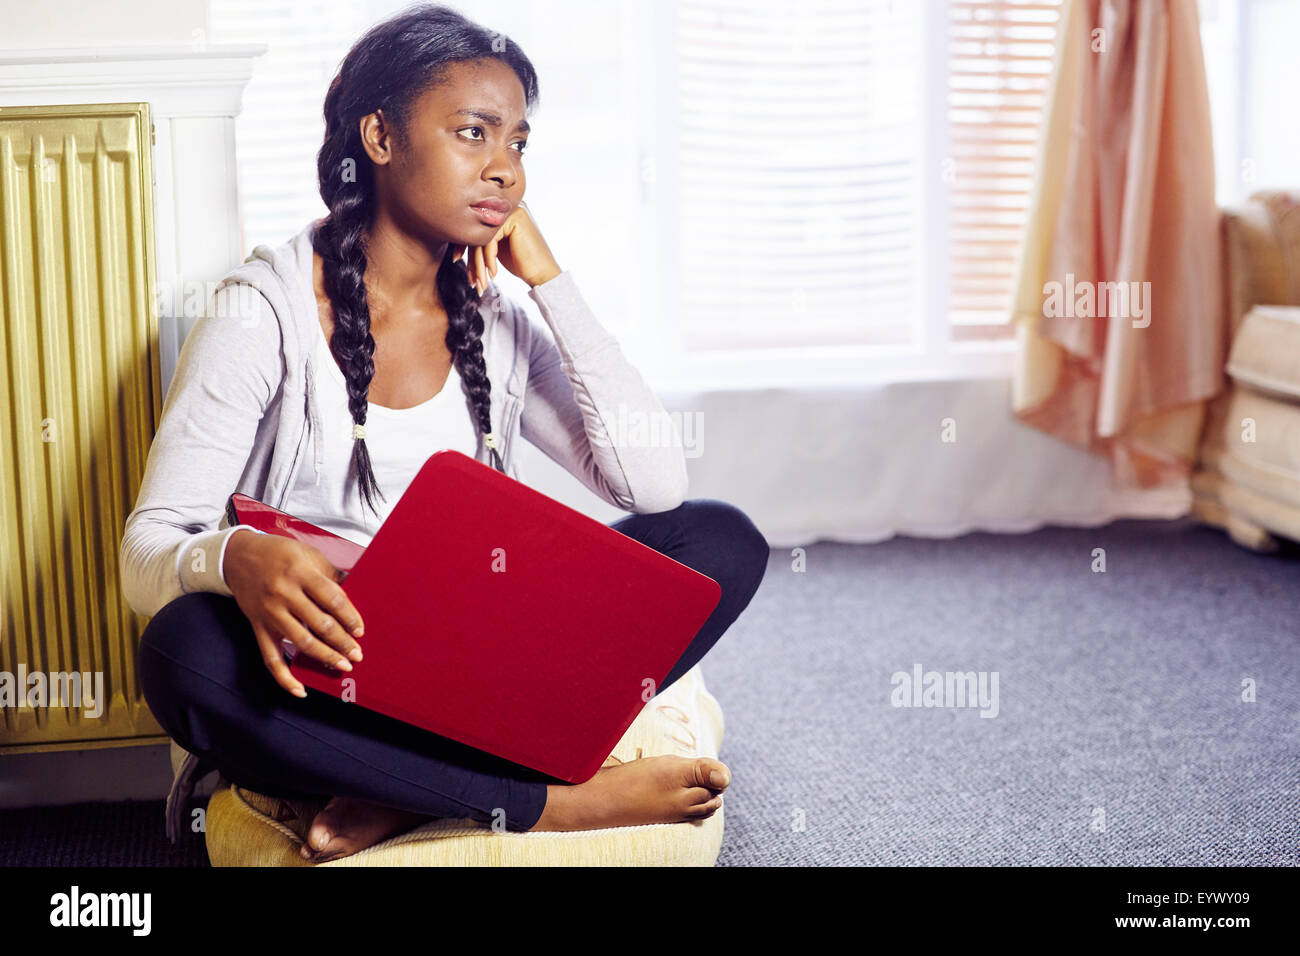 Frustrado chica étnicos sat interiores Imagen De Stock